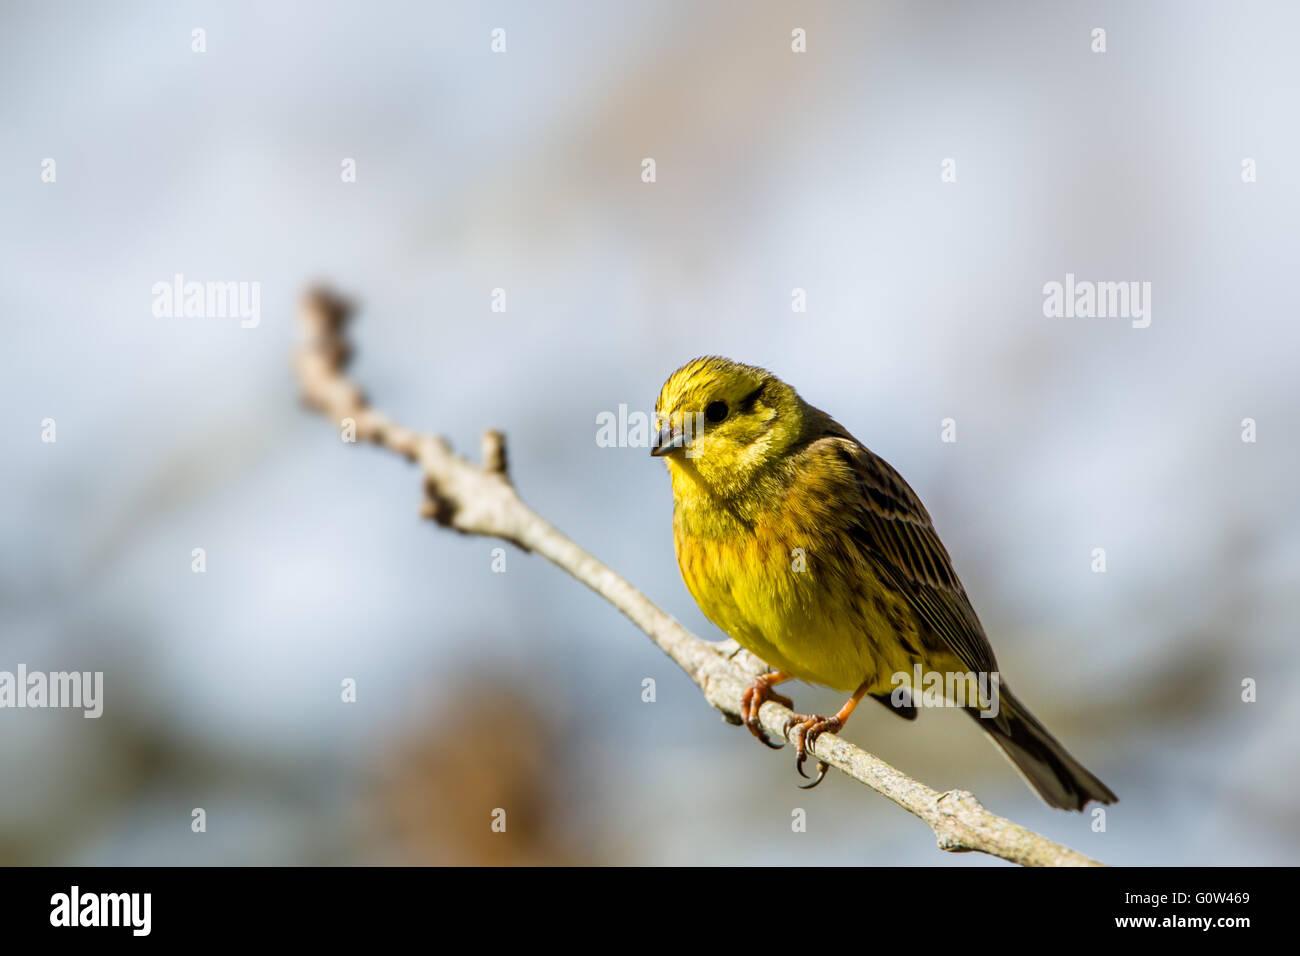 Male Yellowhammer Emberiza citrinella - Stock Image